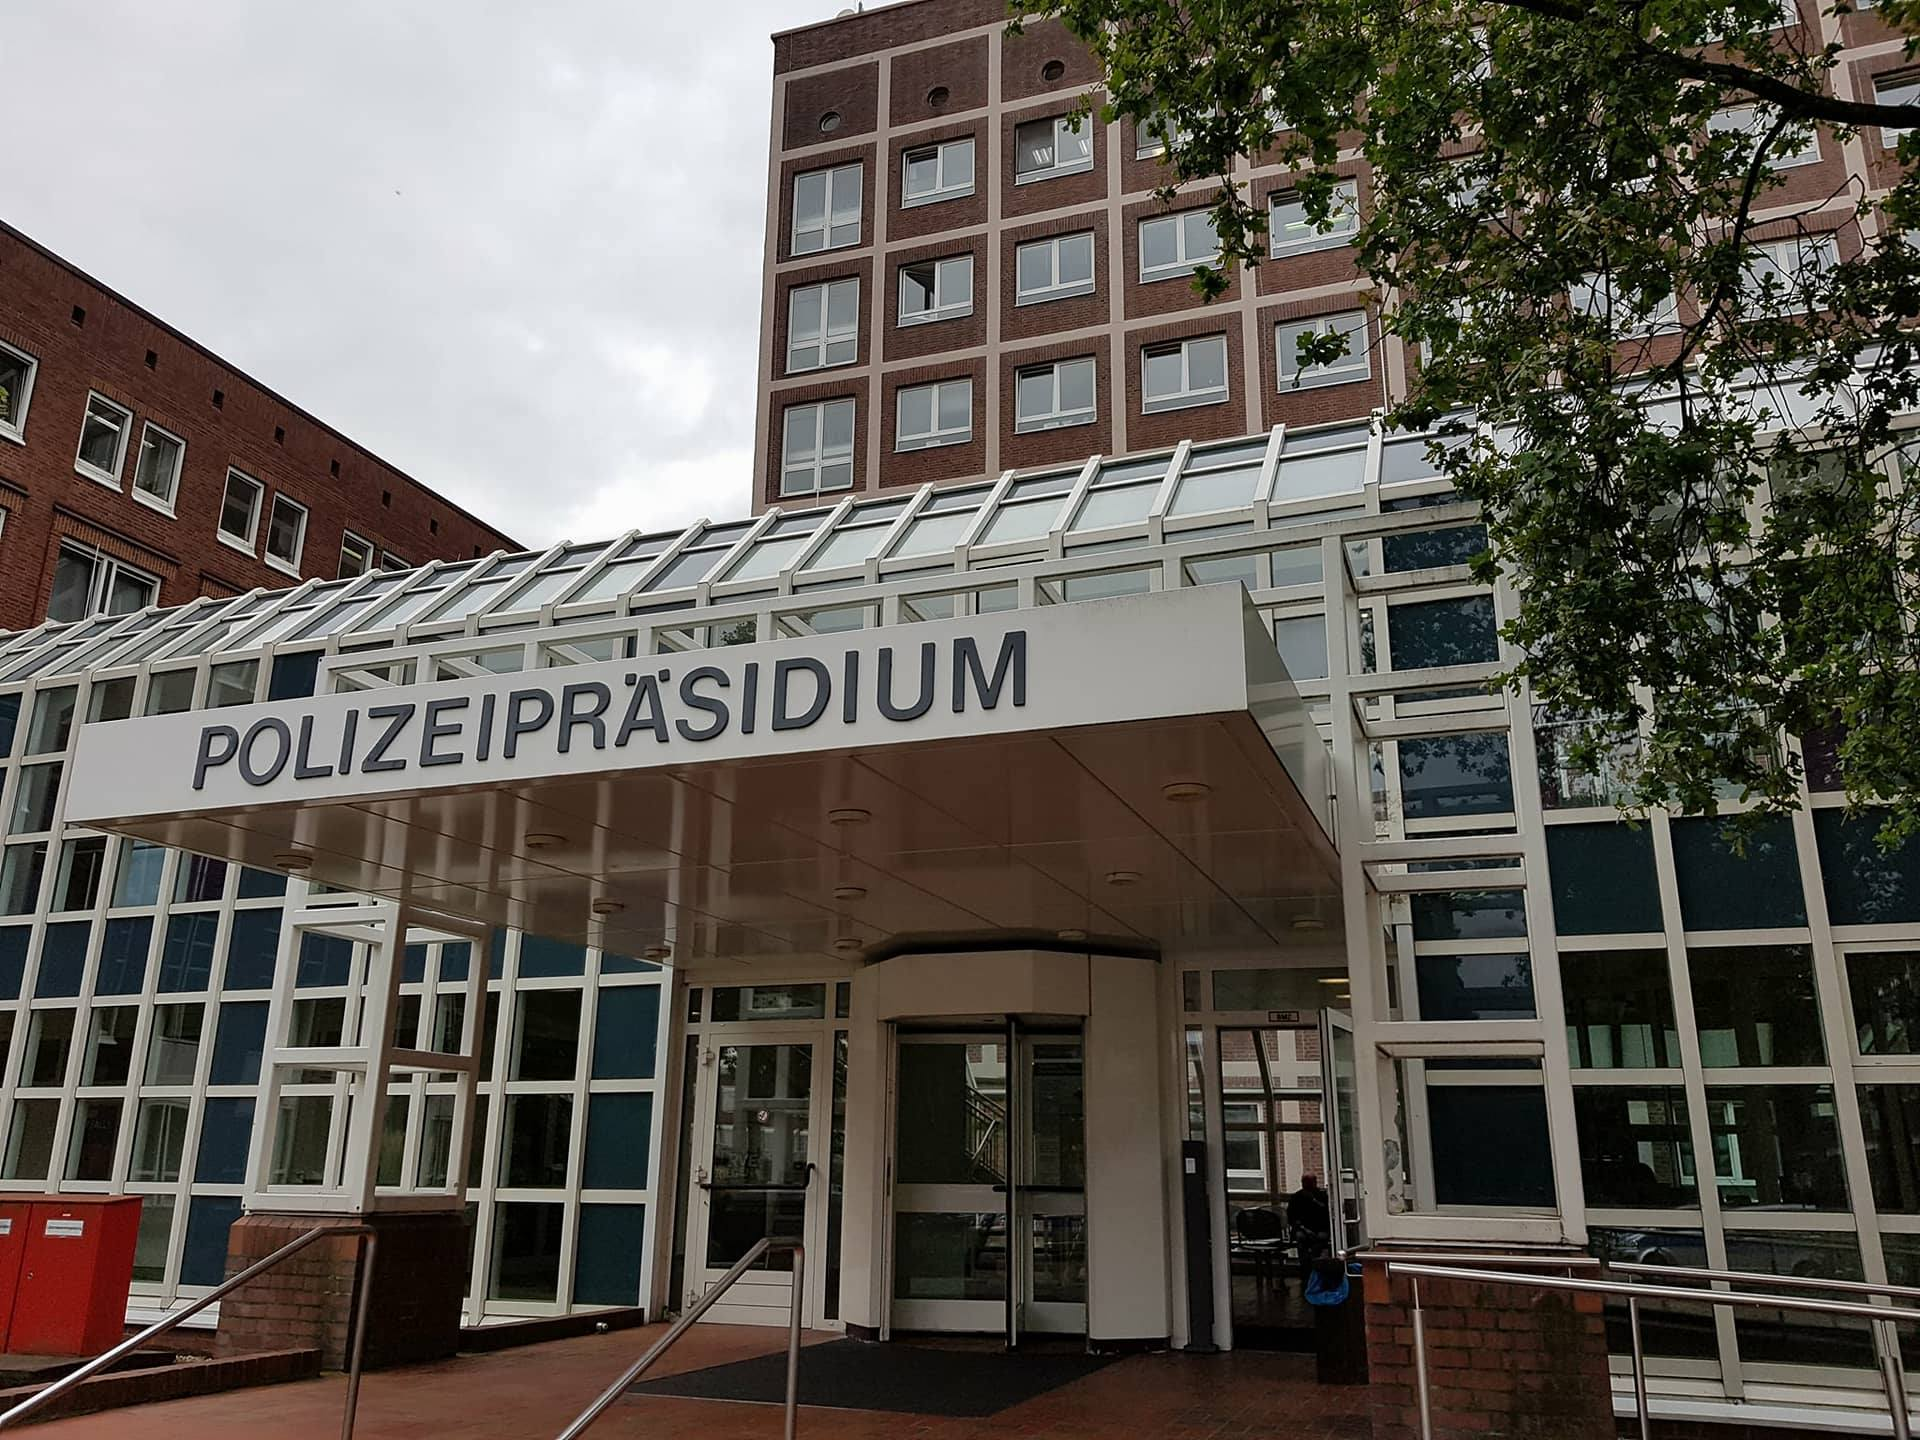 PolizeipreГџe Dortmund